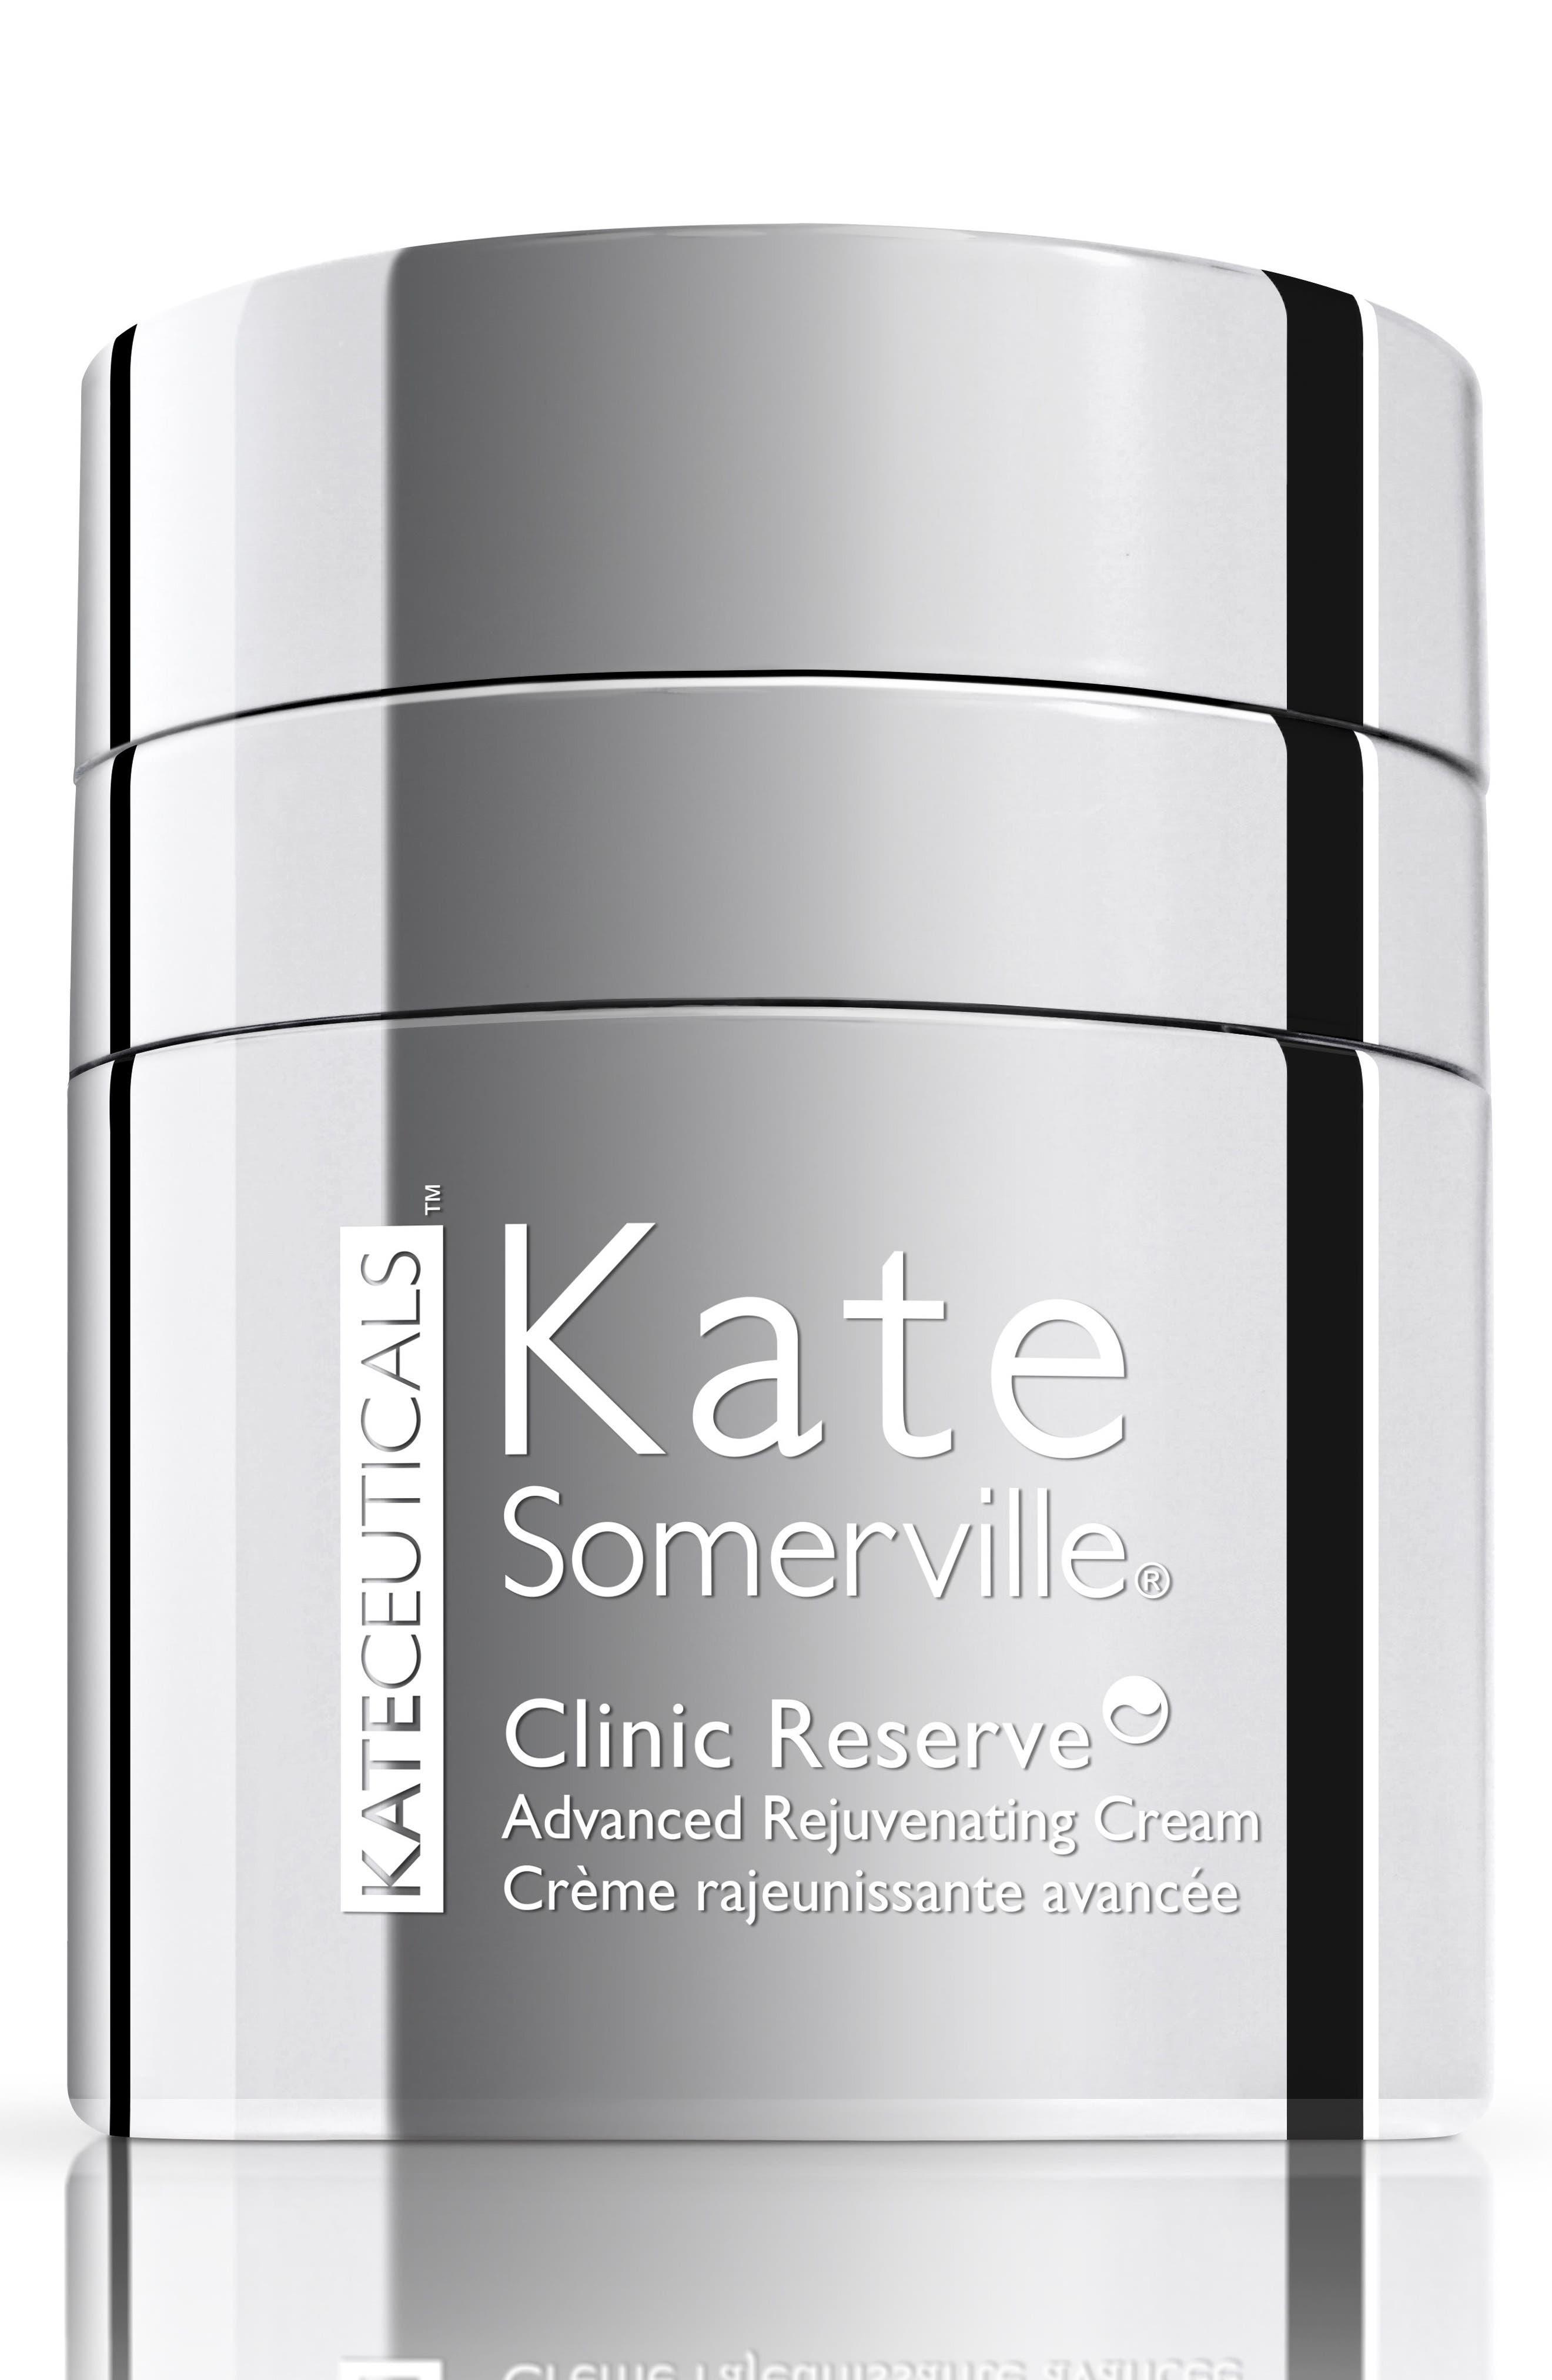 Kate Somerville® KateCeuticals® Clinic Reserve Advanced Rejuvenating Cream (Nordstrom Exclusive)